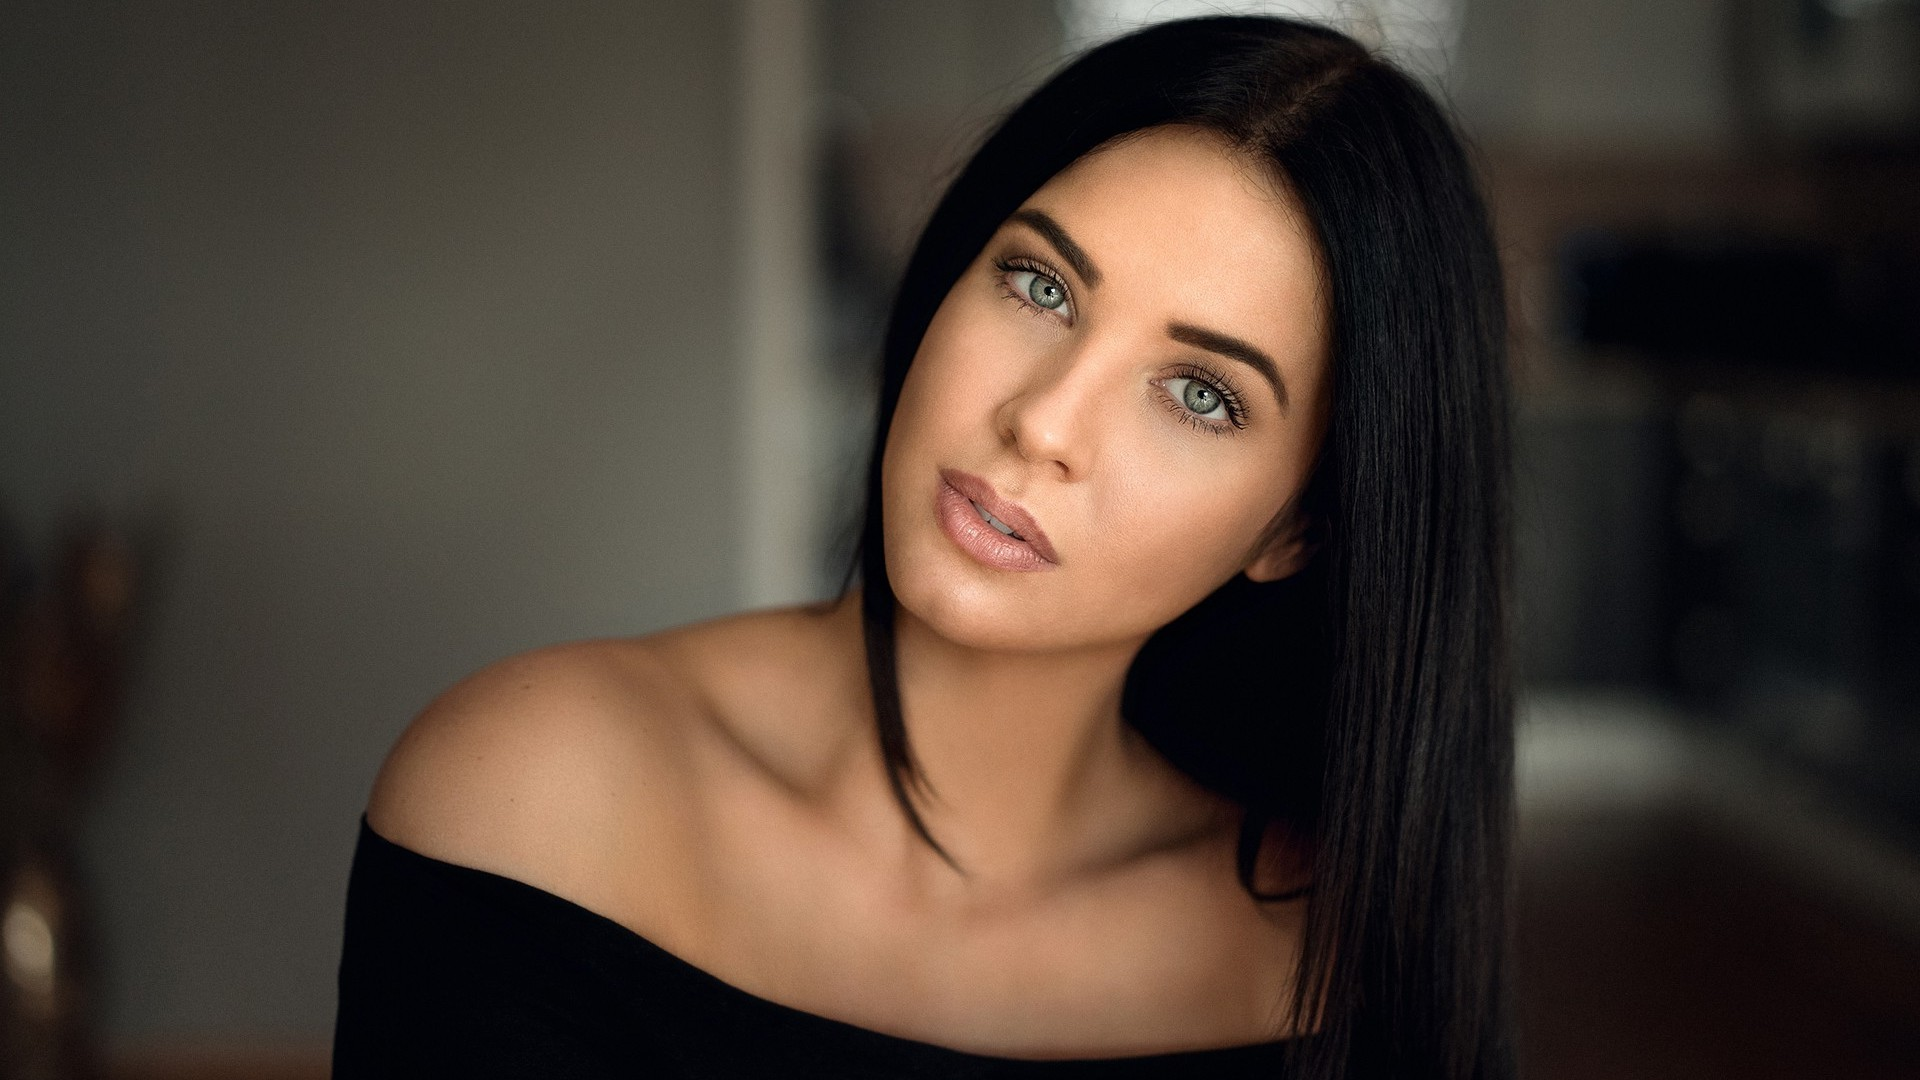 Girl dating ukrain Ukrainian Women